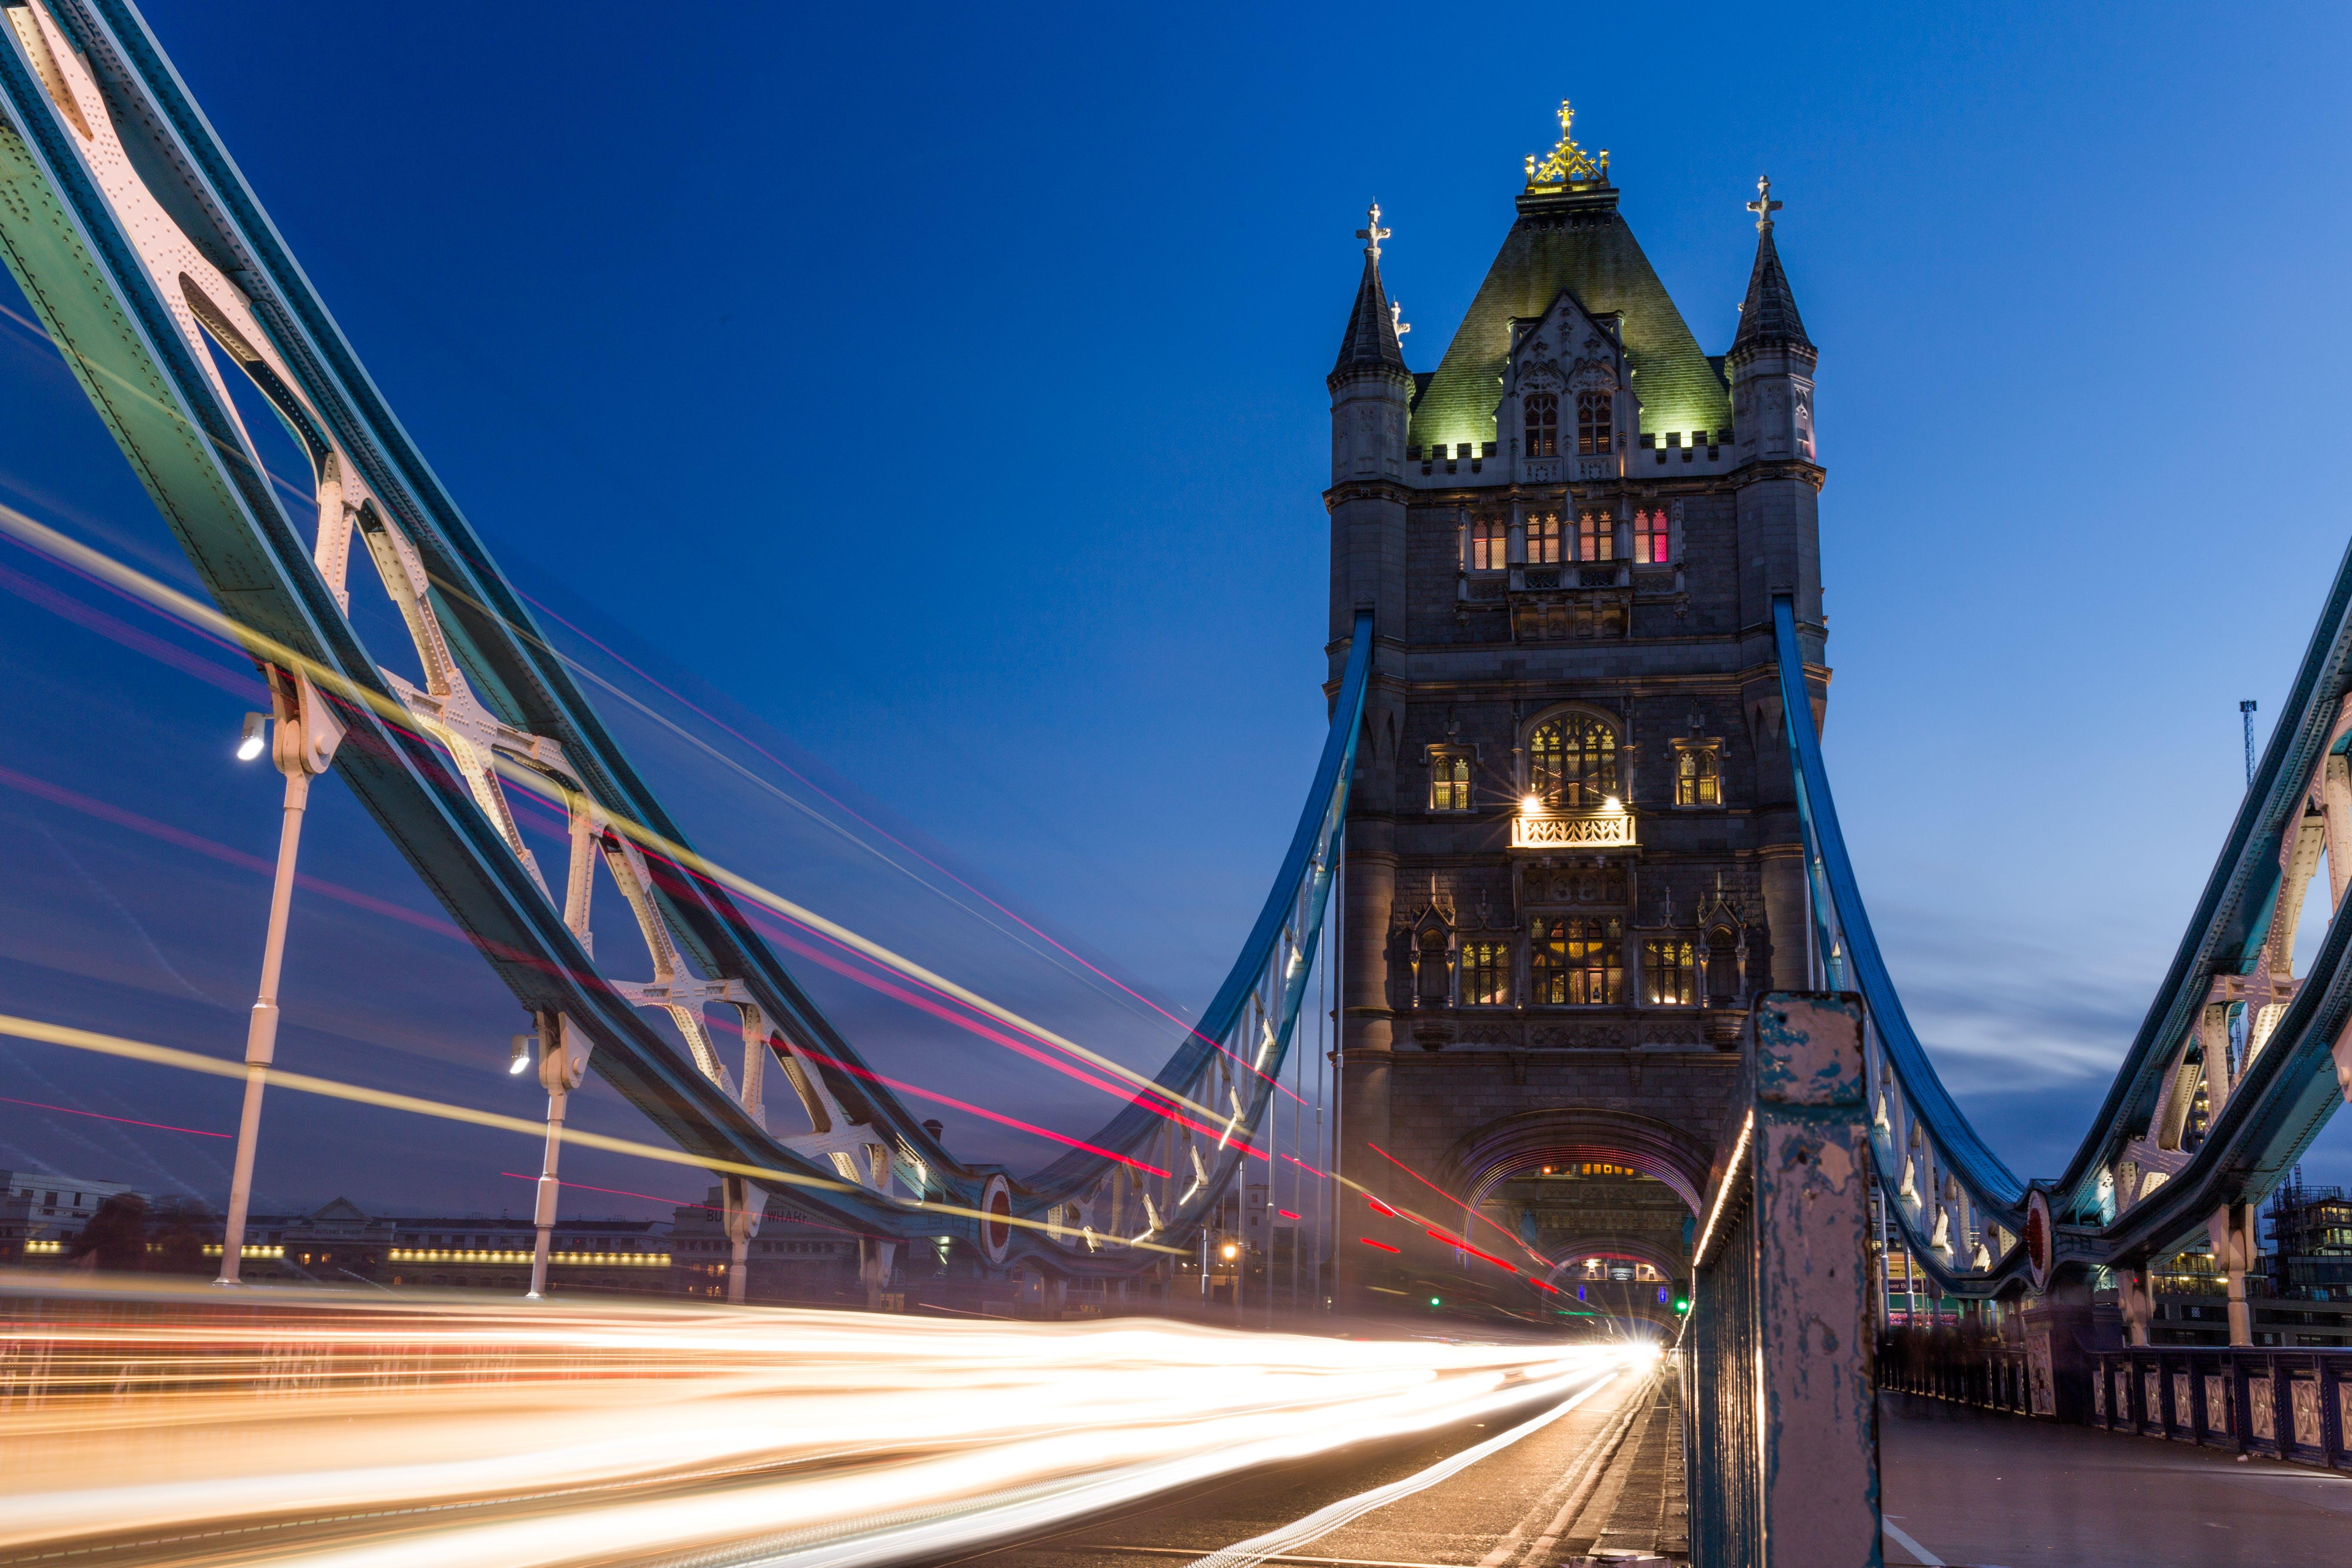 Timelapse Photography of Landmark Bridge